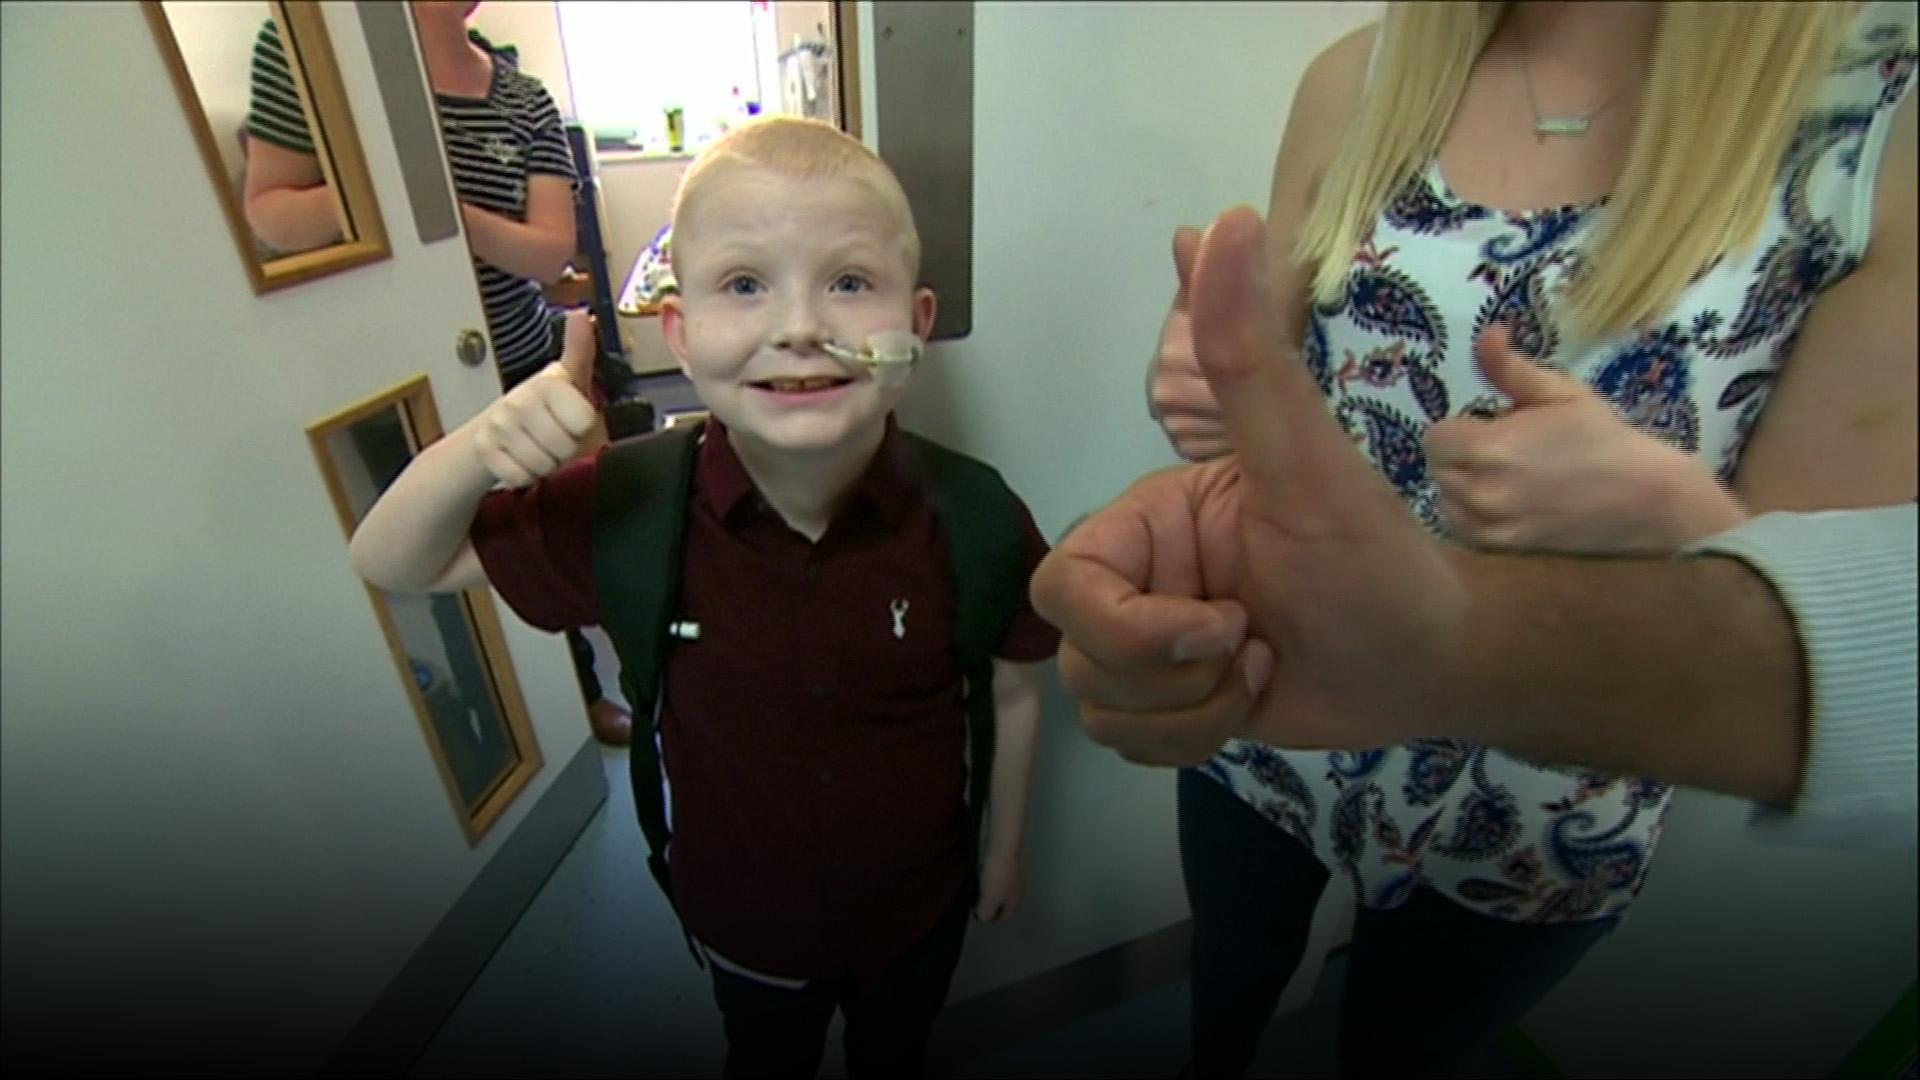 Berusia 7 tahun, bocah ini sudah menerima transplantasi 5 organ tubuh